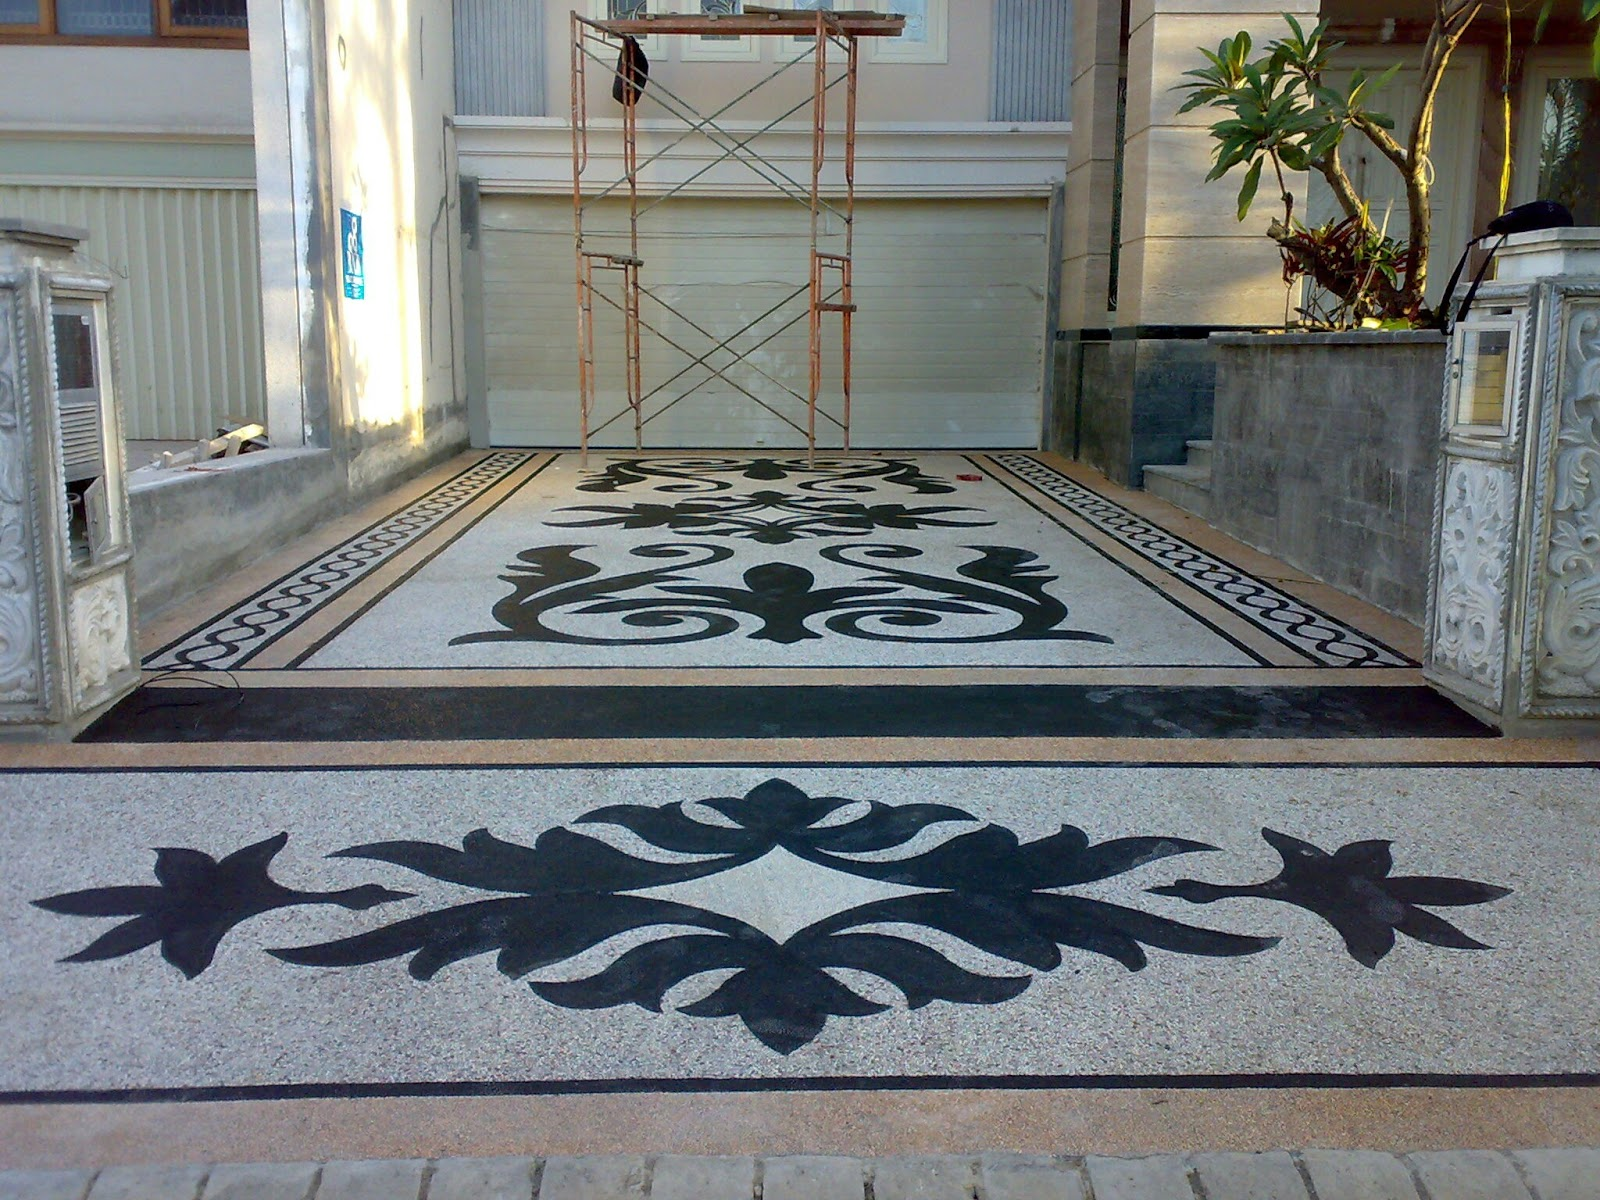 Tukang Batu Sikat Lantai Carpot surabaya